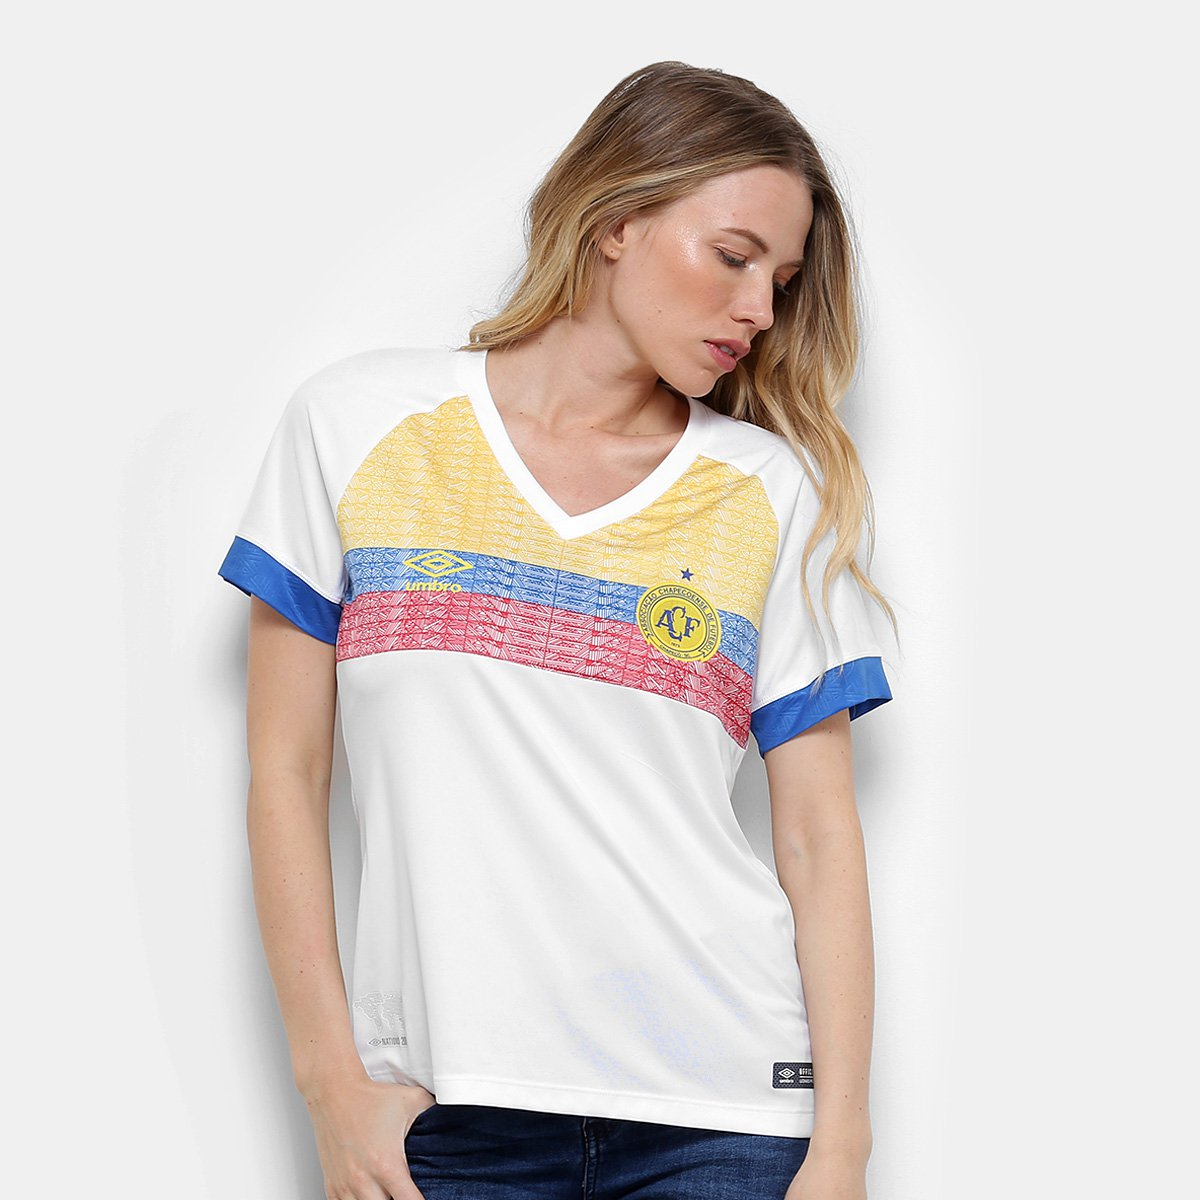 2018 II Pasion Branco Camisa La Azul Chapecoense Torcedor e s Umbro n° Feminina wR5UEaq